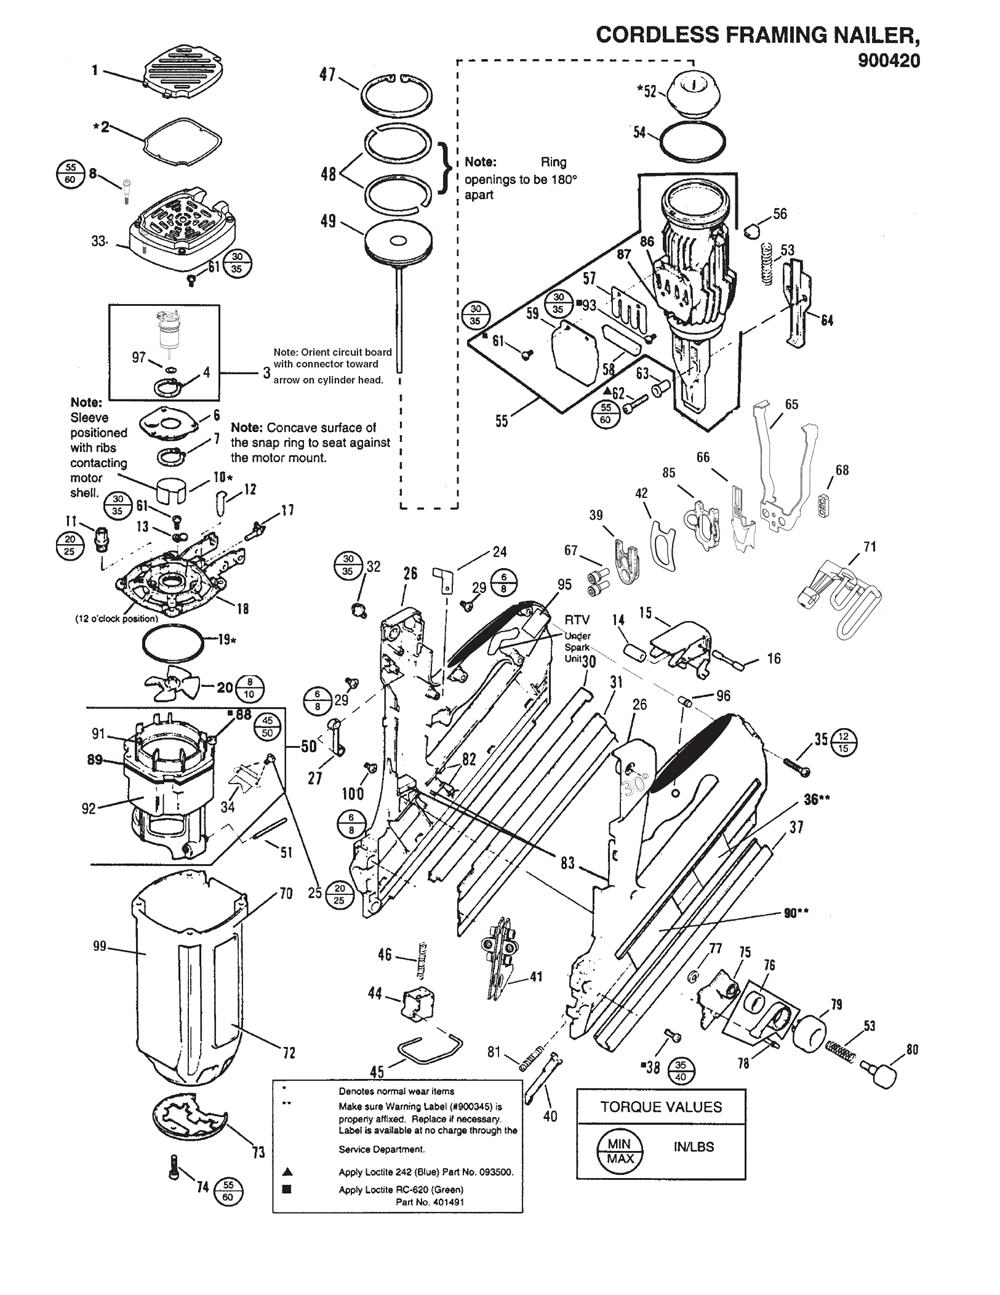 Cool wire feed welder parts gallery wiring diagram ideas